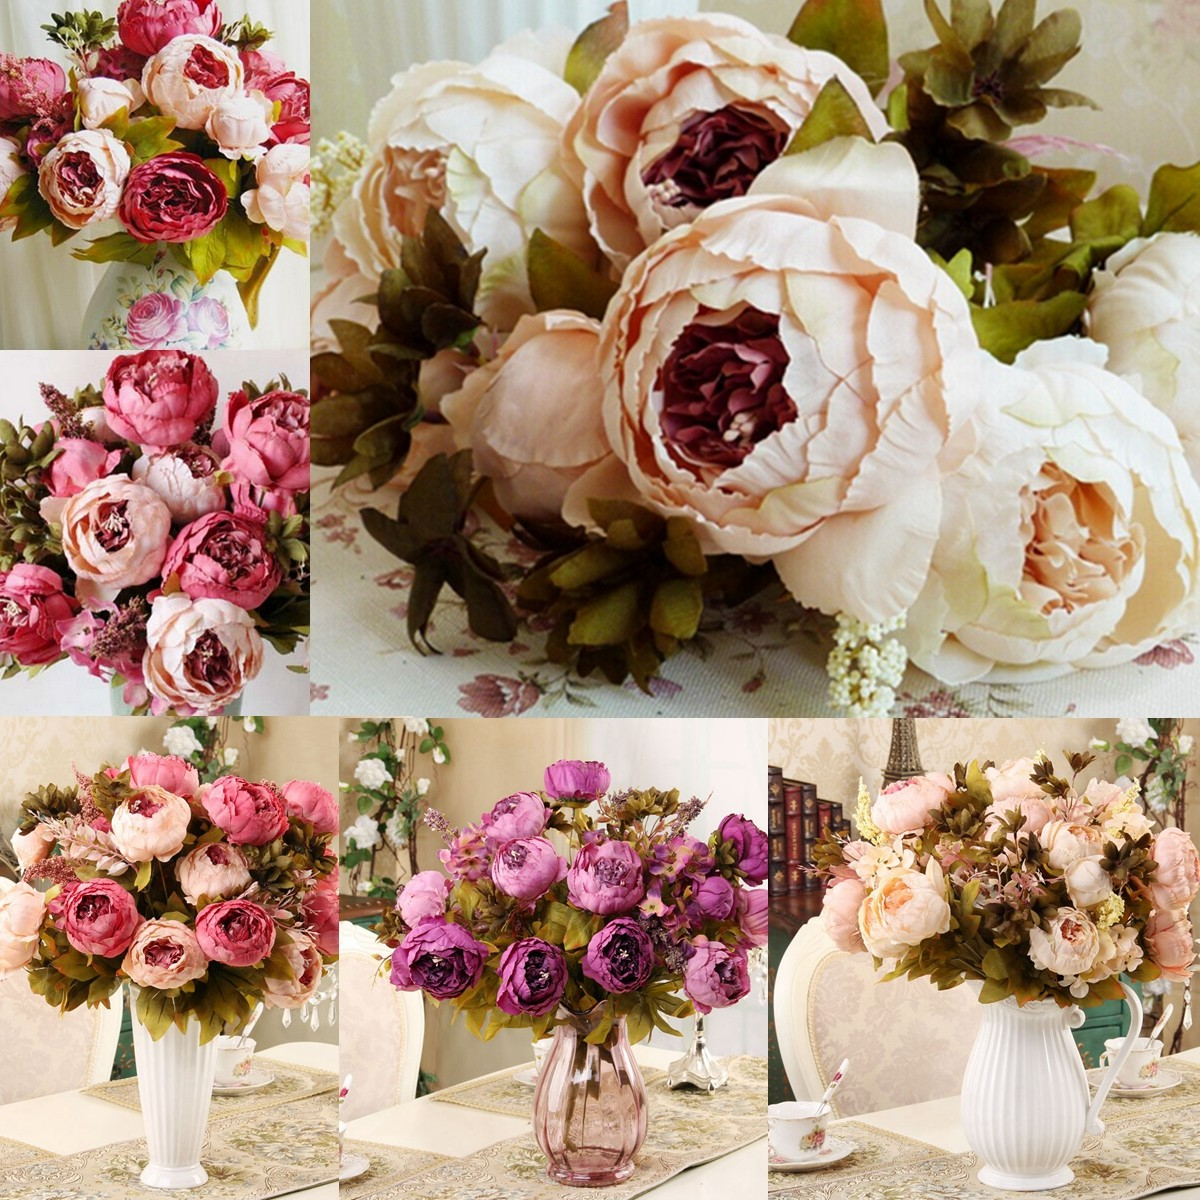 1 Bouquet Vintage Artificial Peony Silk furnitureampampampampdiy Flowers 6 Heads Bouquet Wedding Bridal Party Garden Decoration